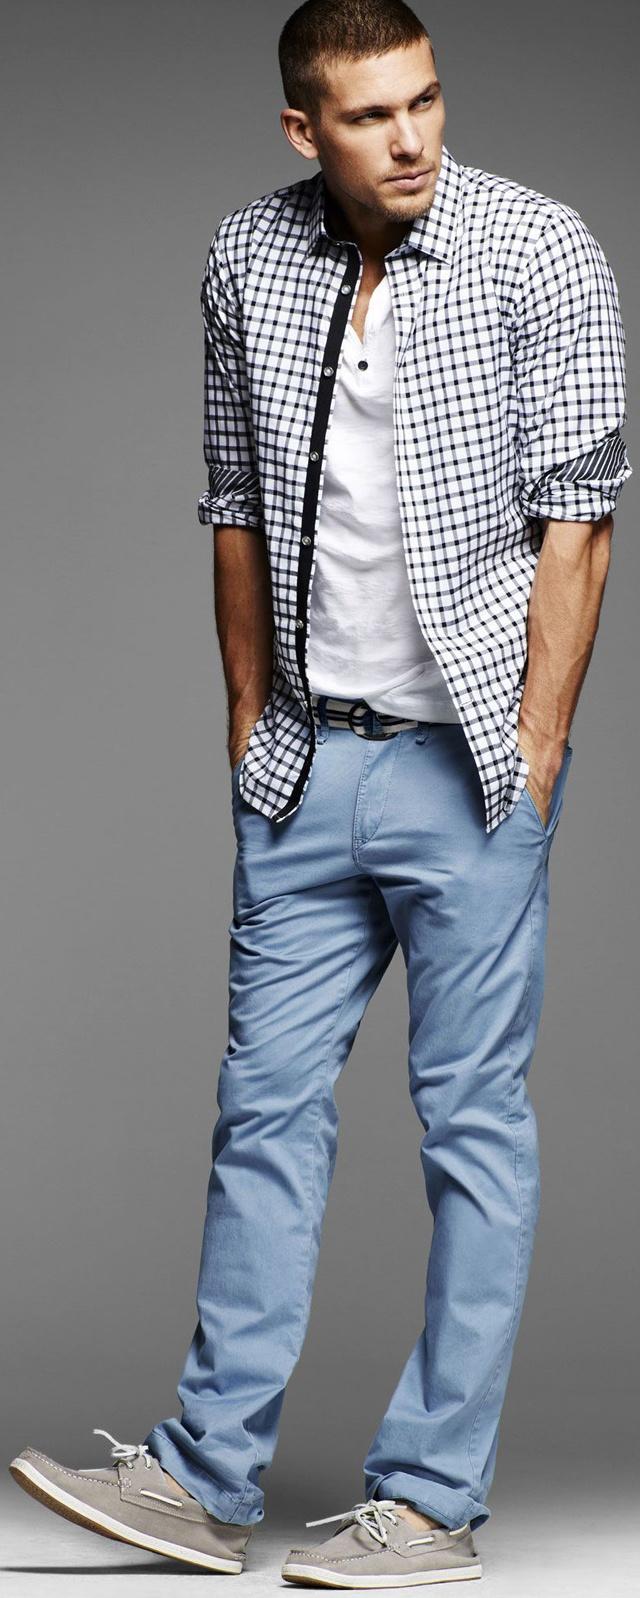 Fresh! ::light blues & greys... (Adam Senn for Express Summer 2012)